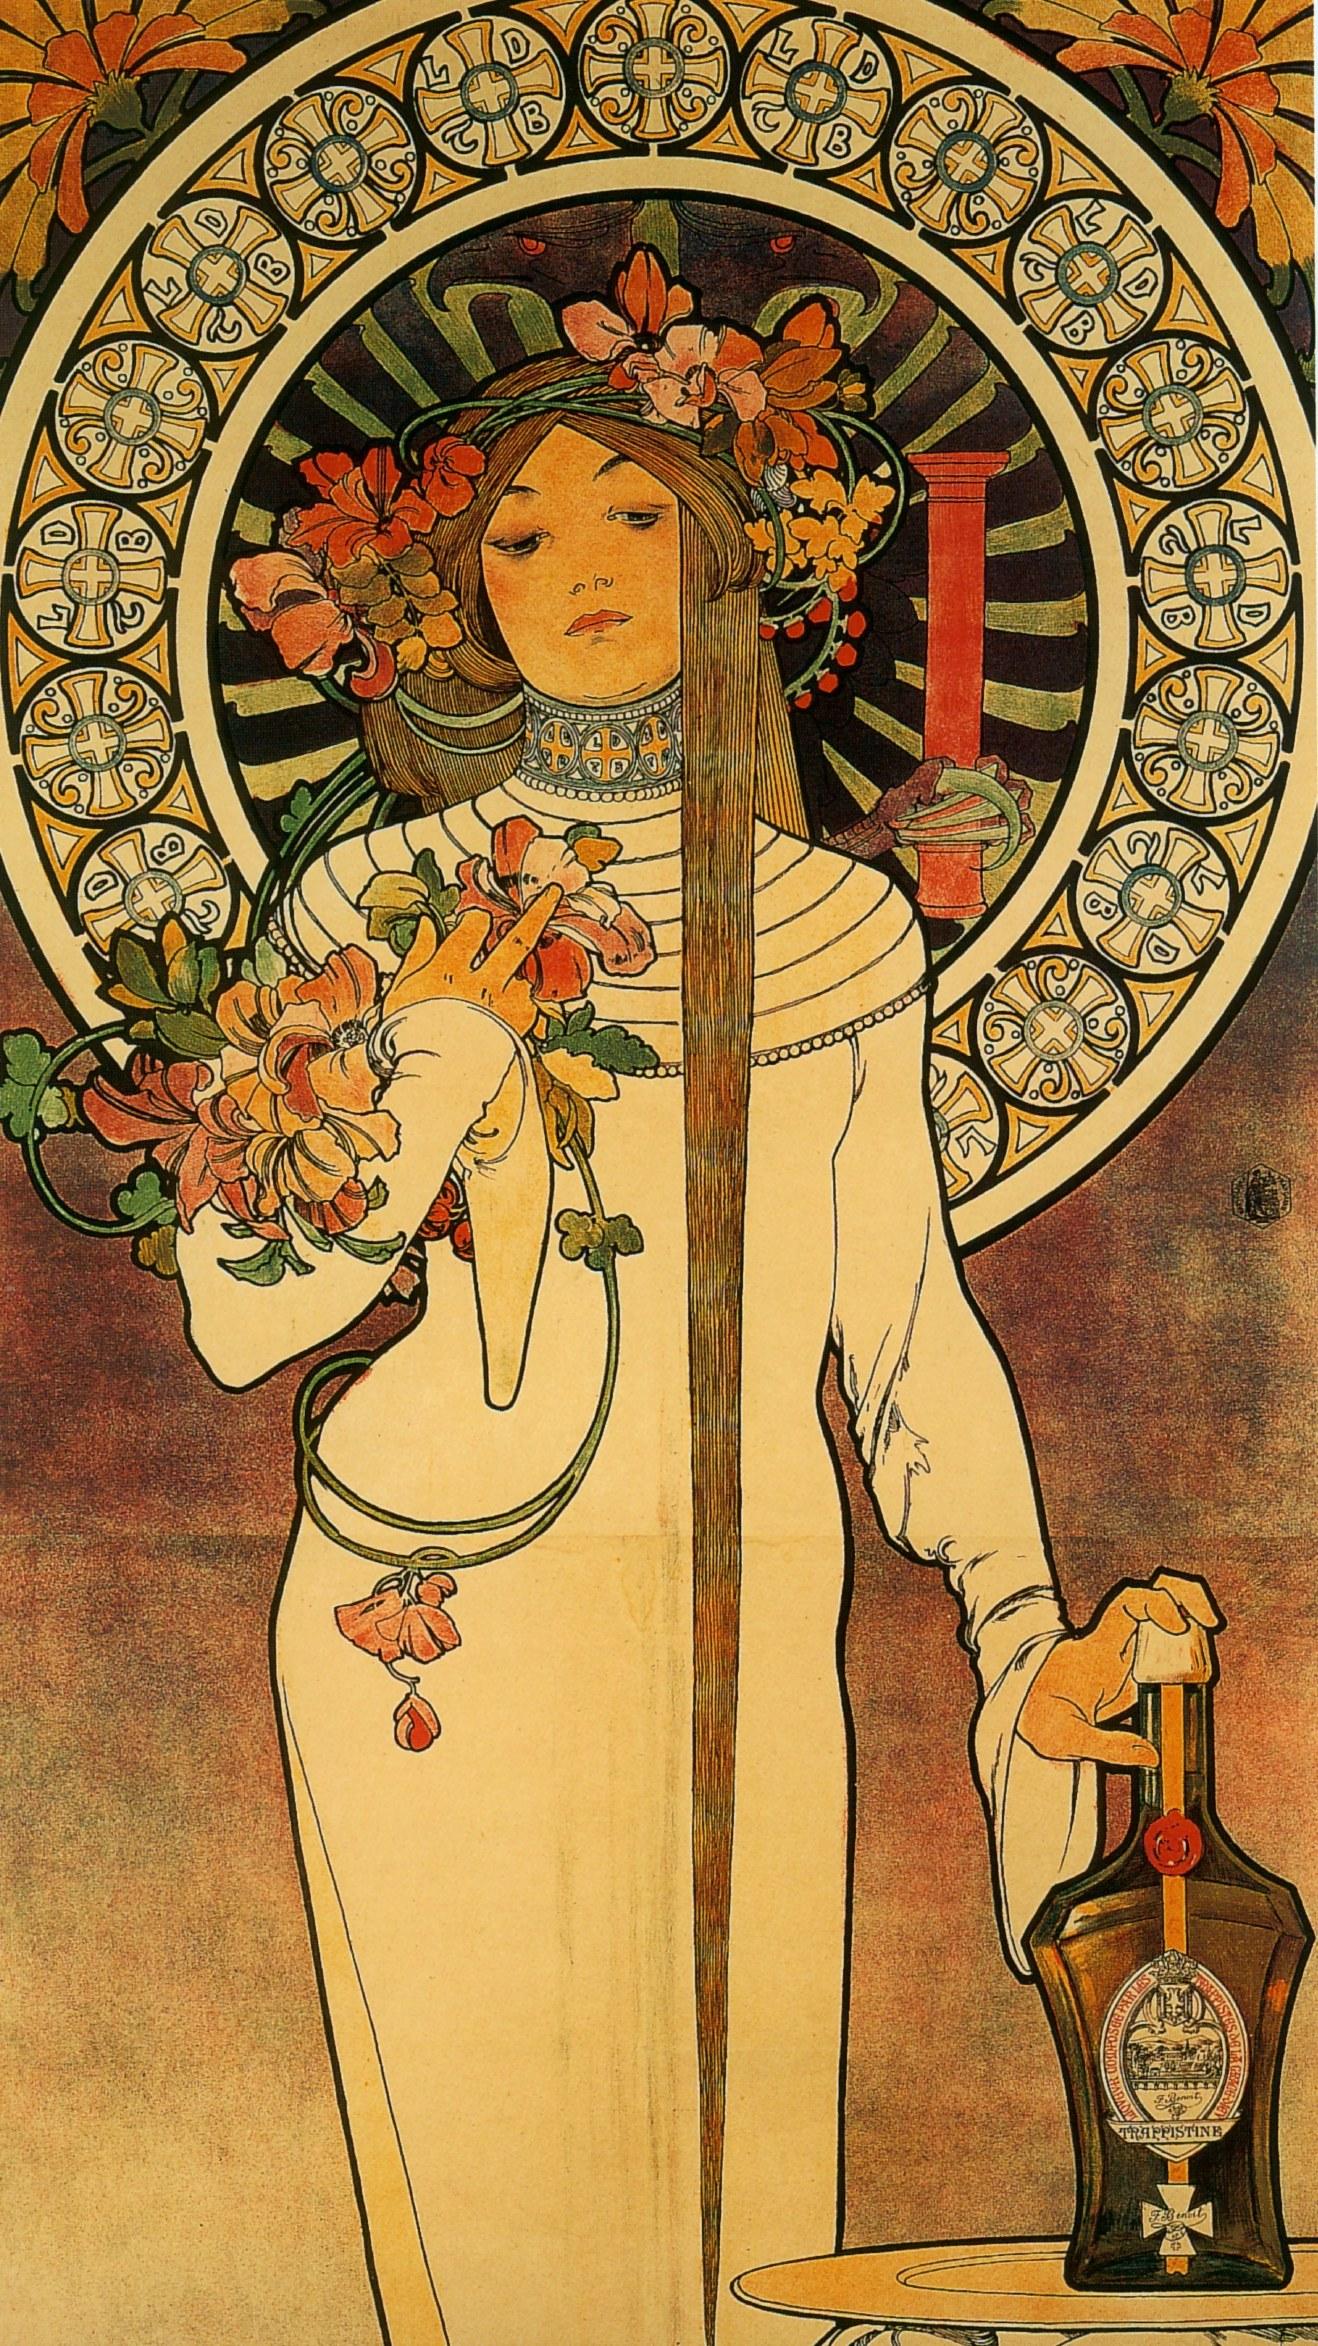 Реклама La Trappistine. Фрагмент-1897